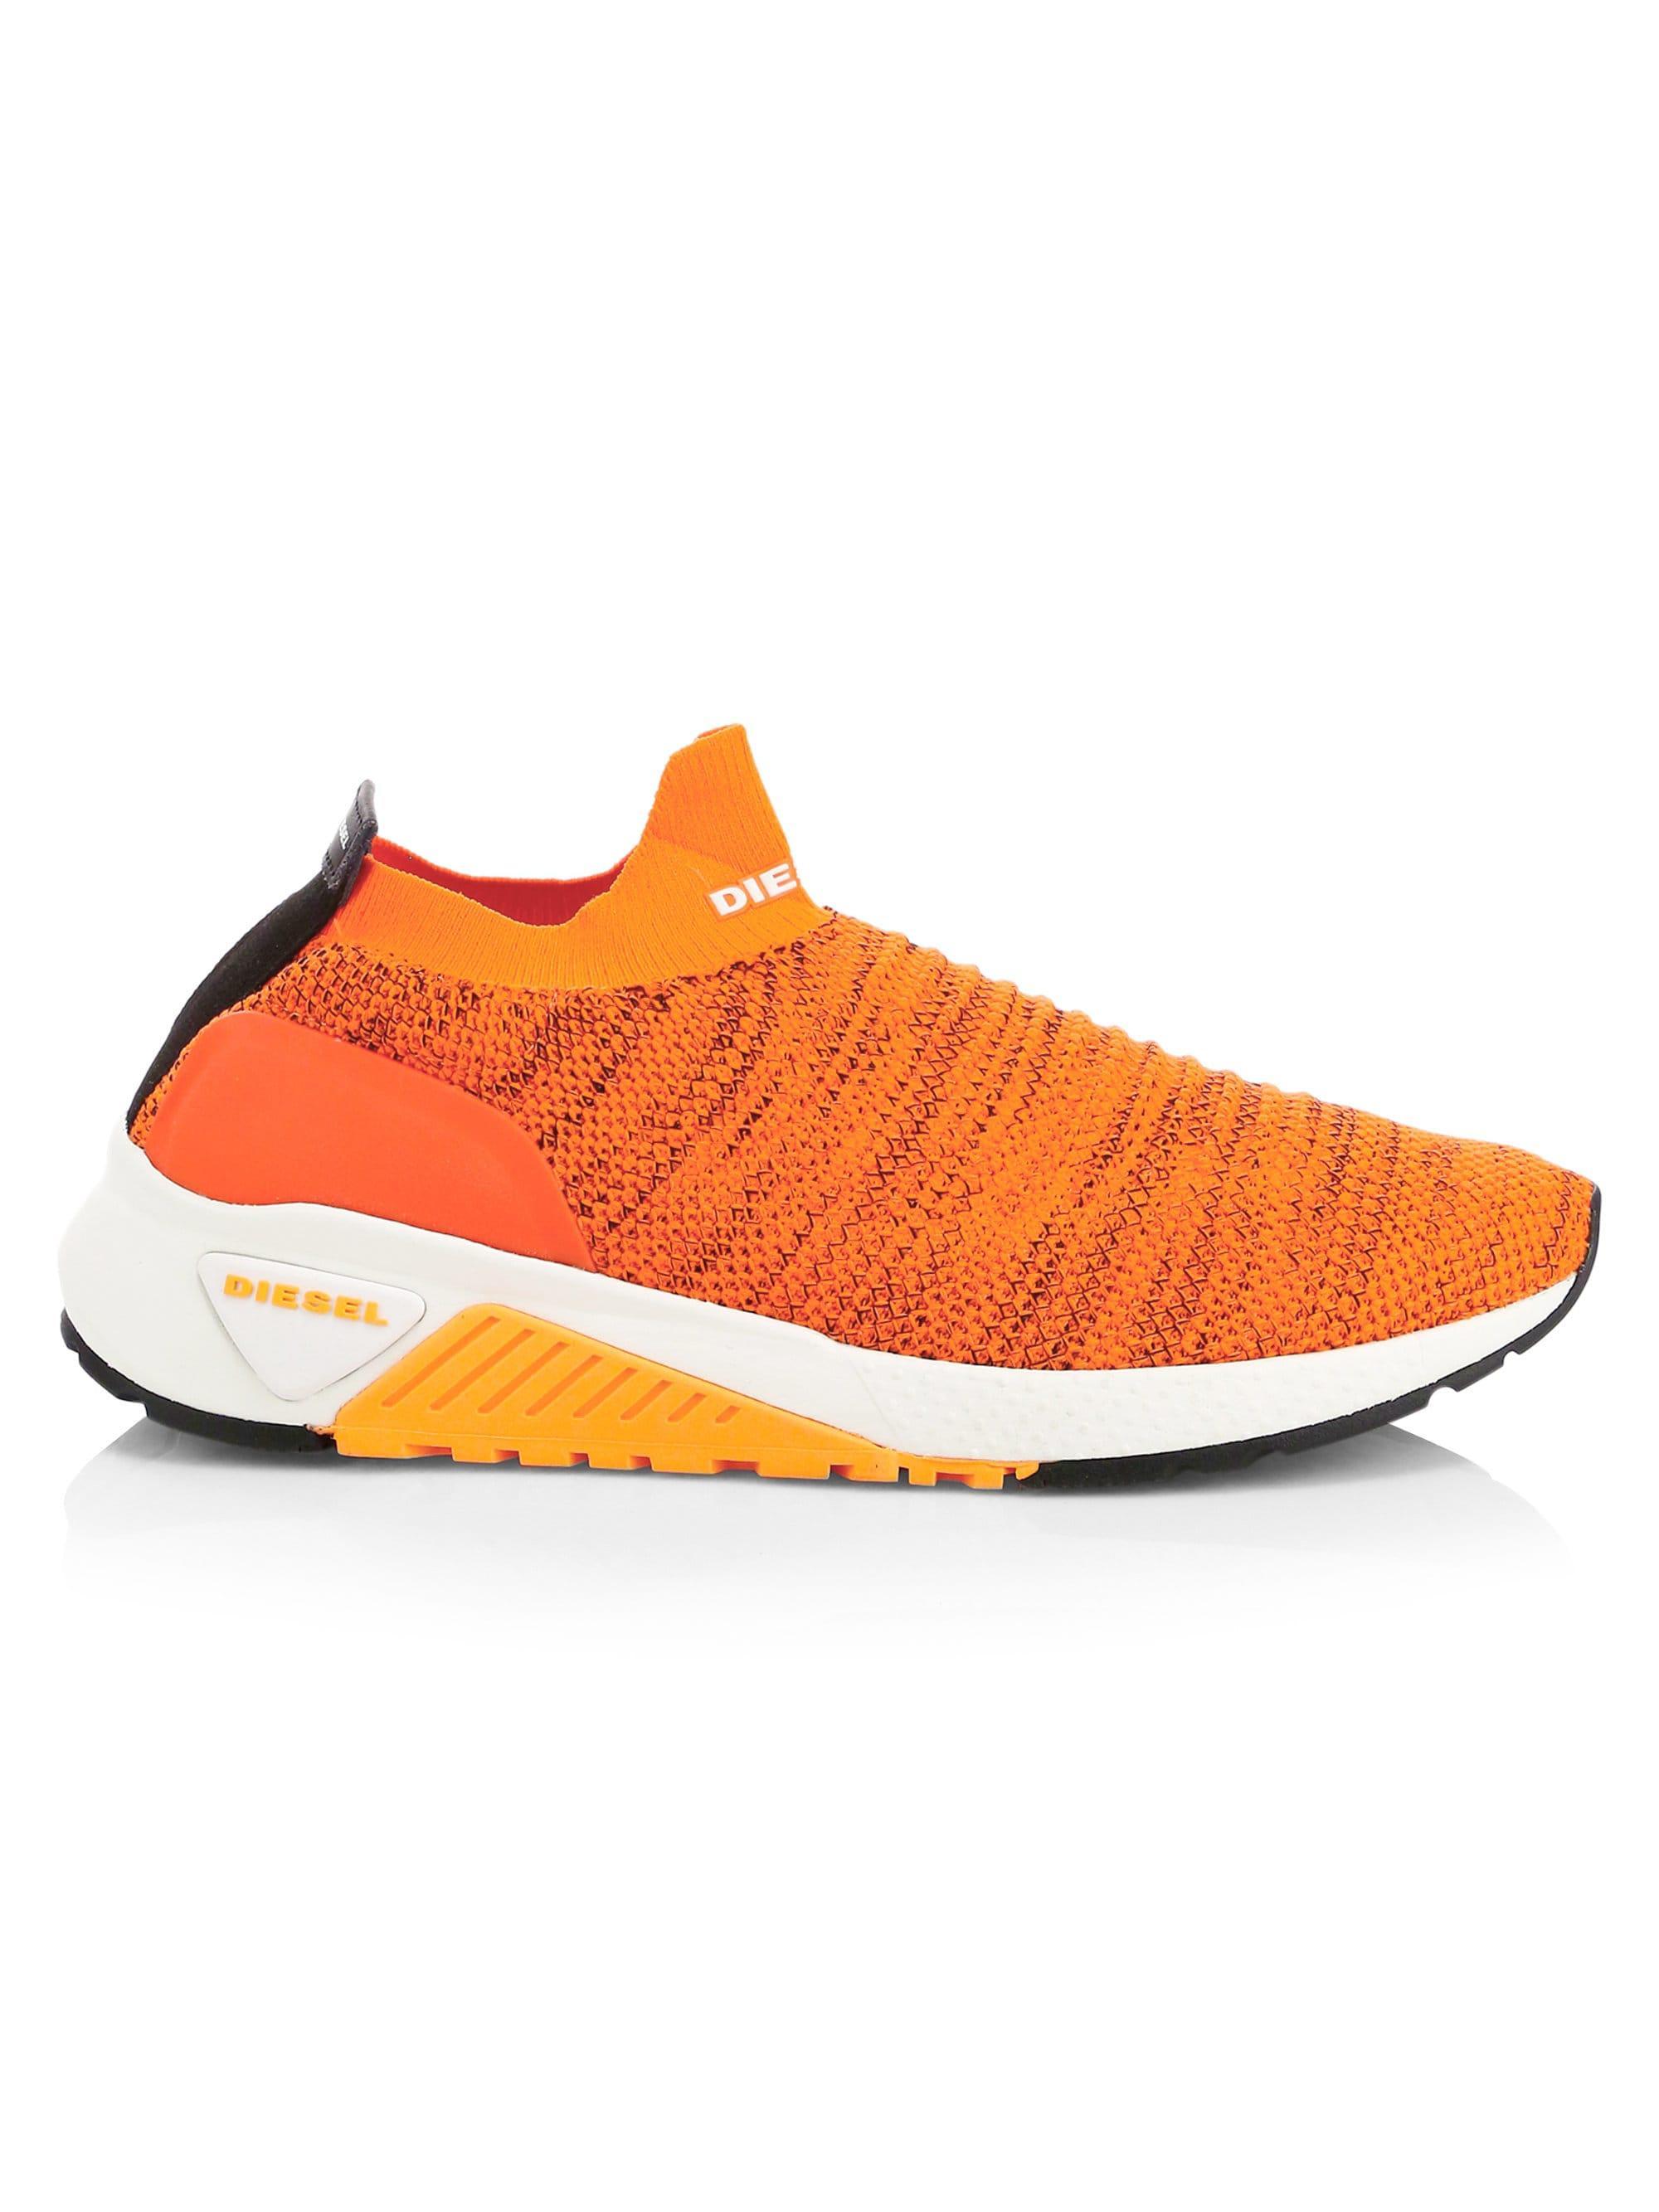 free shipping cb911 801a2 DIESEL Mens Athletic Sock Sneakers - Orange - Size 7 Uk (8 U